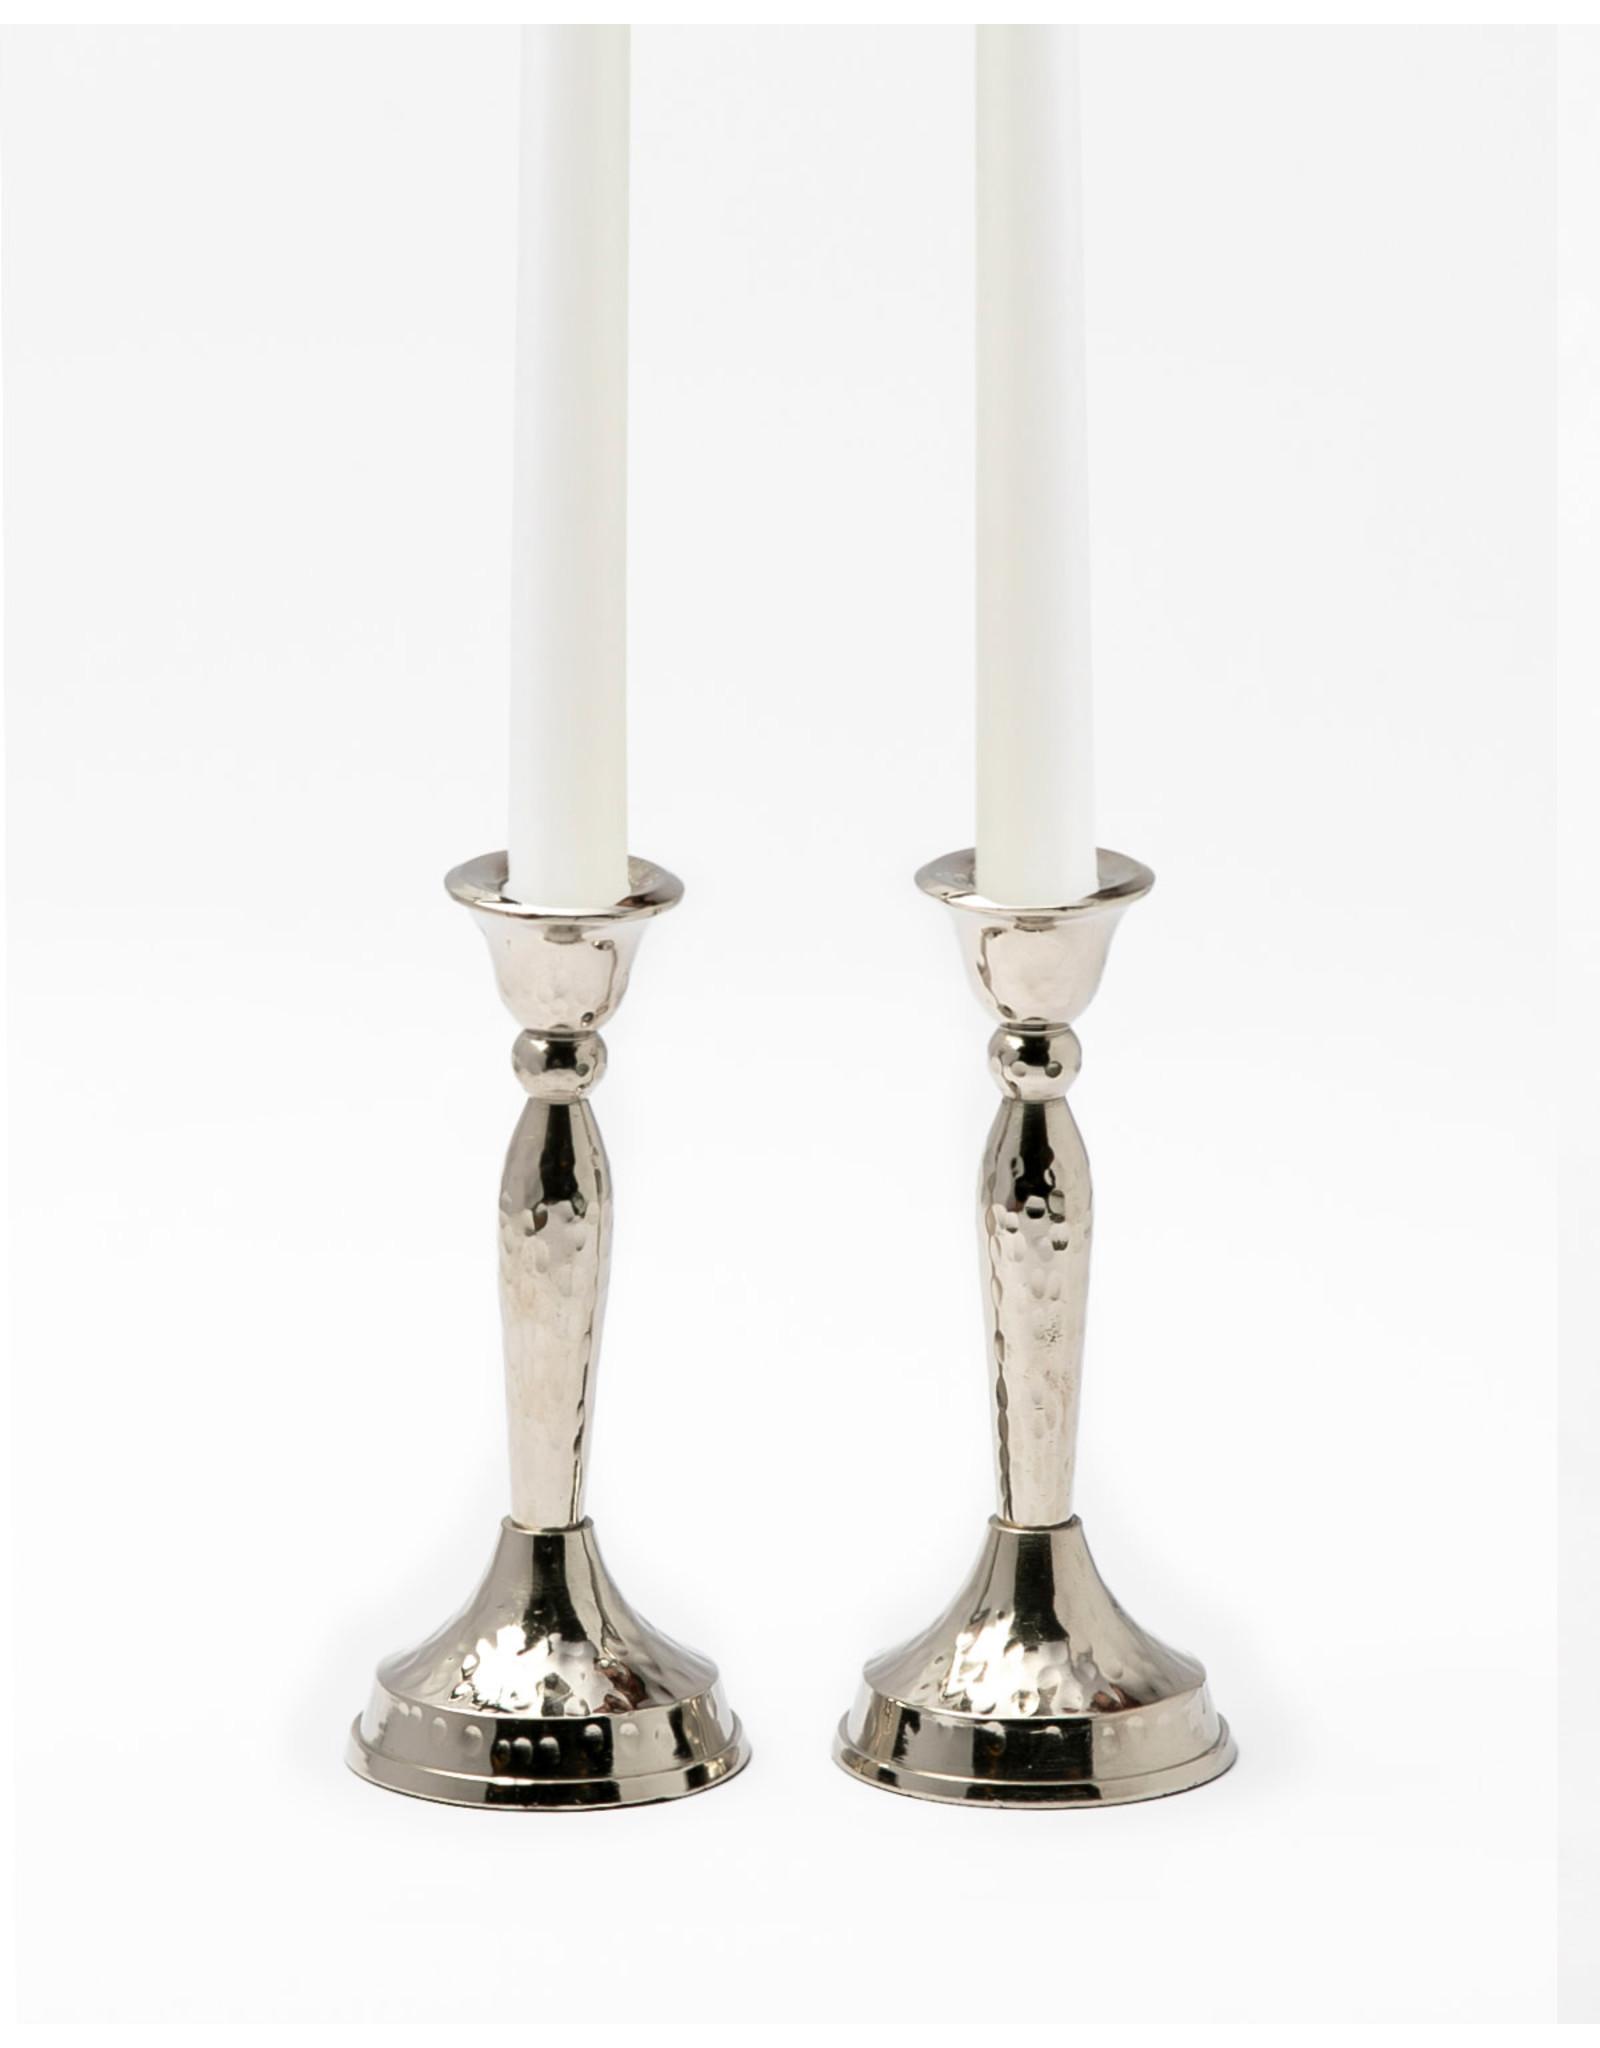 Candlestick Nickel Hammer